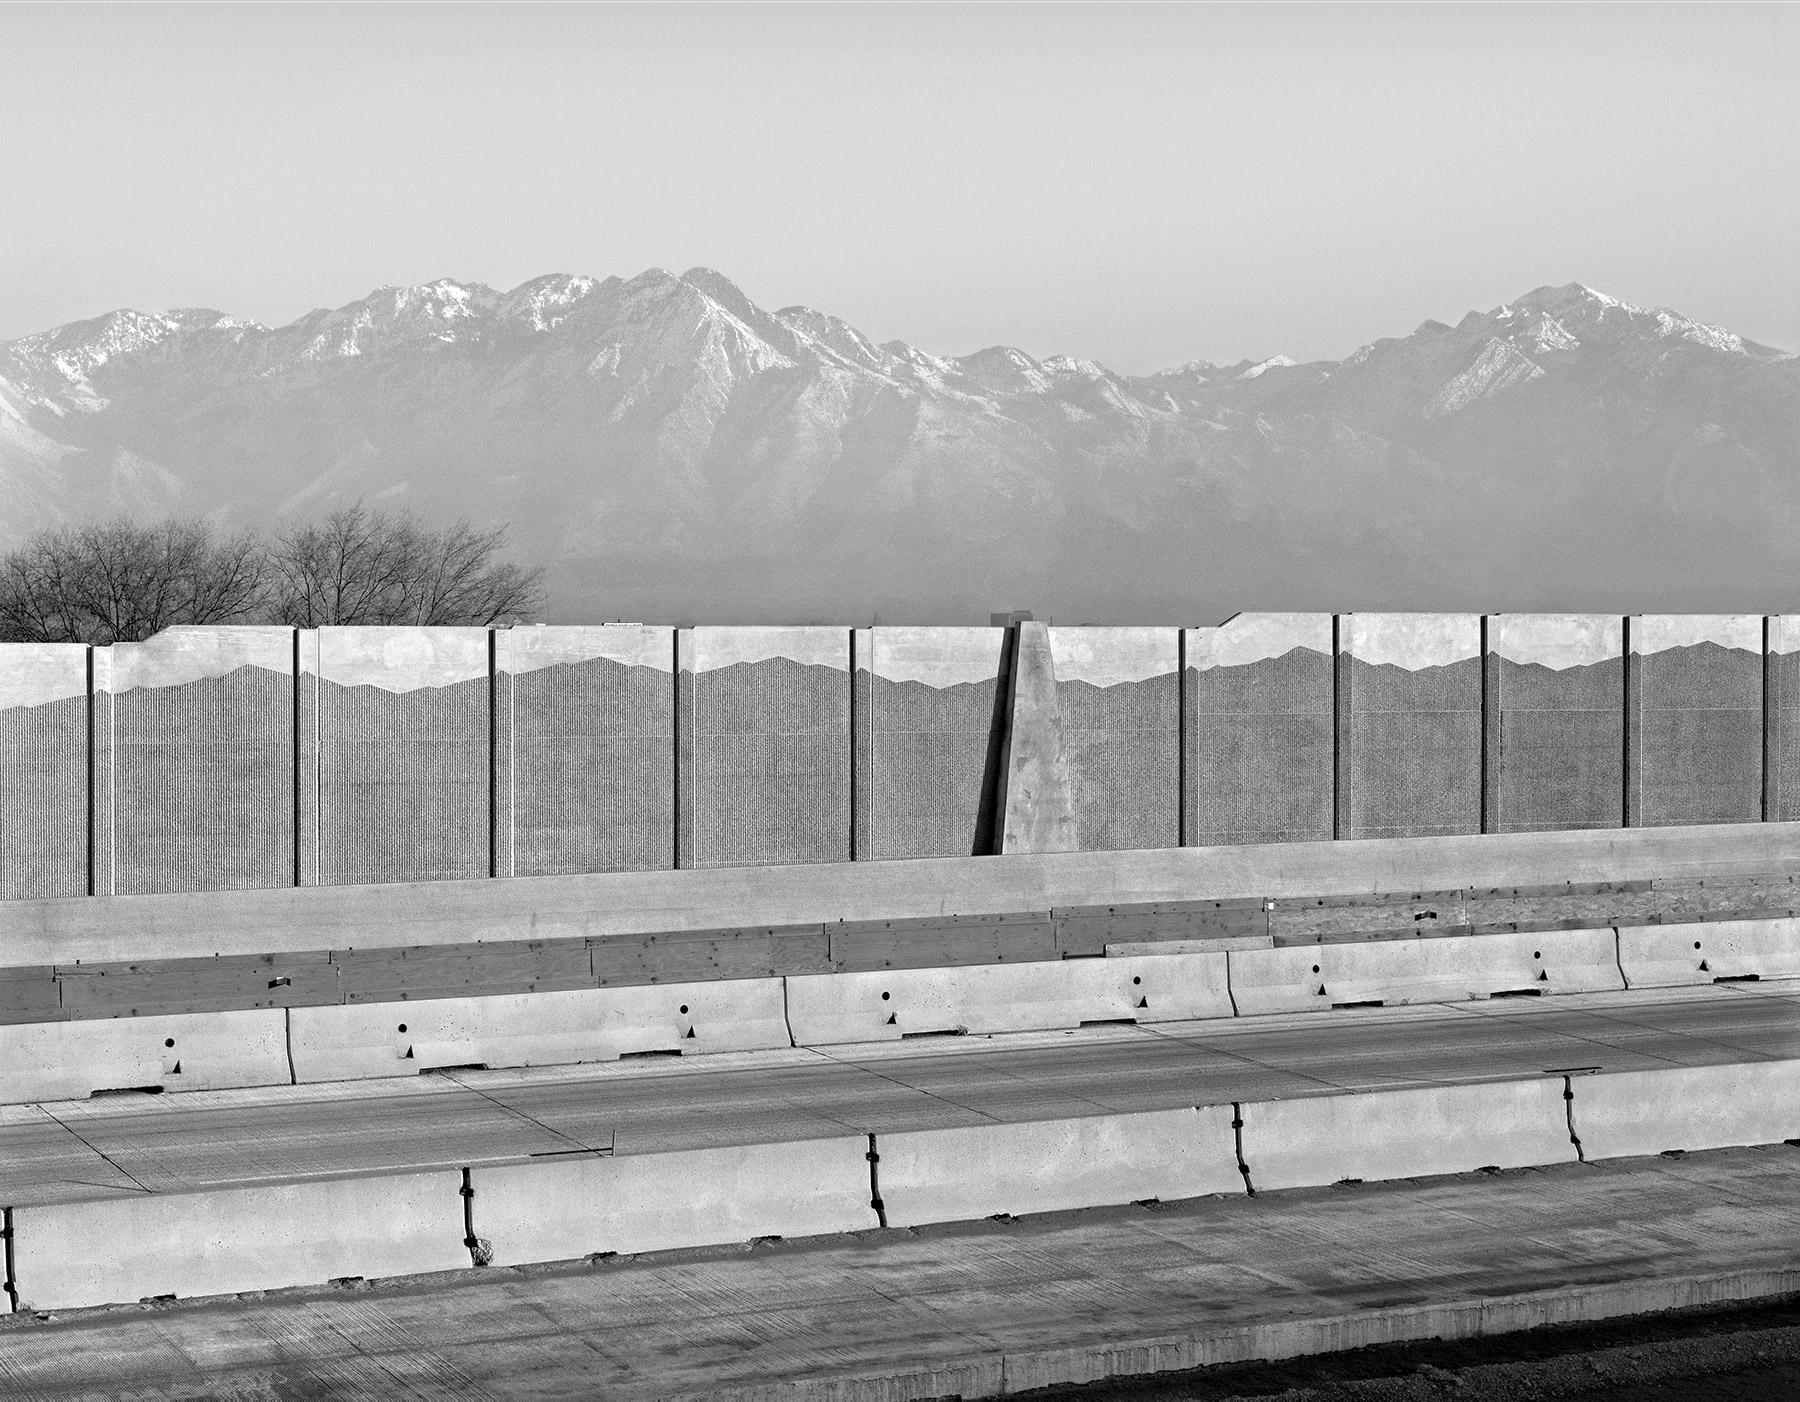 Interstate 15, Lone Peak, Sandy, Utah, 2000.